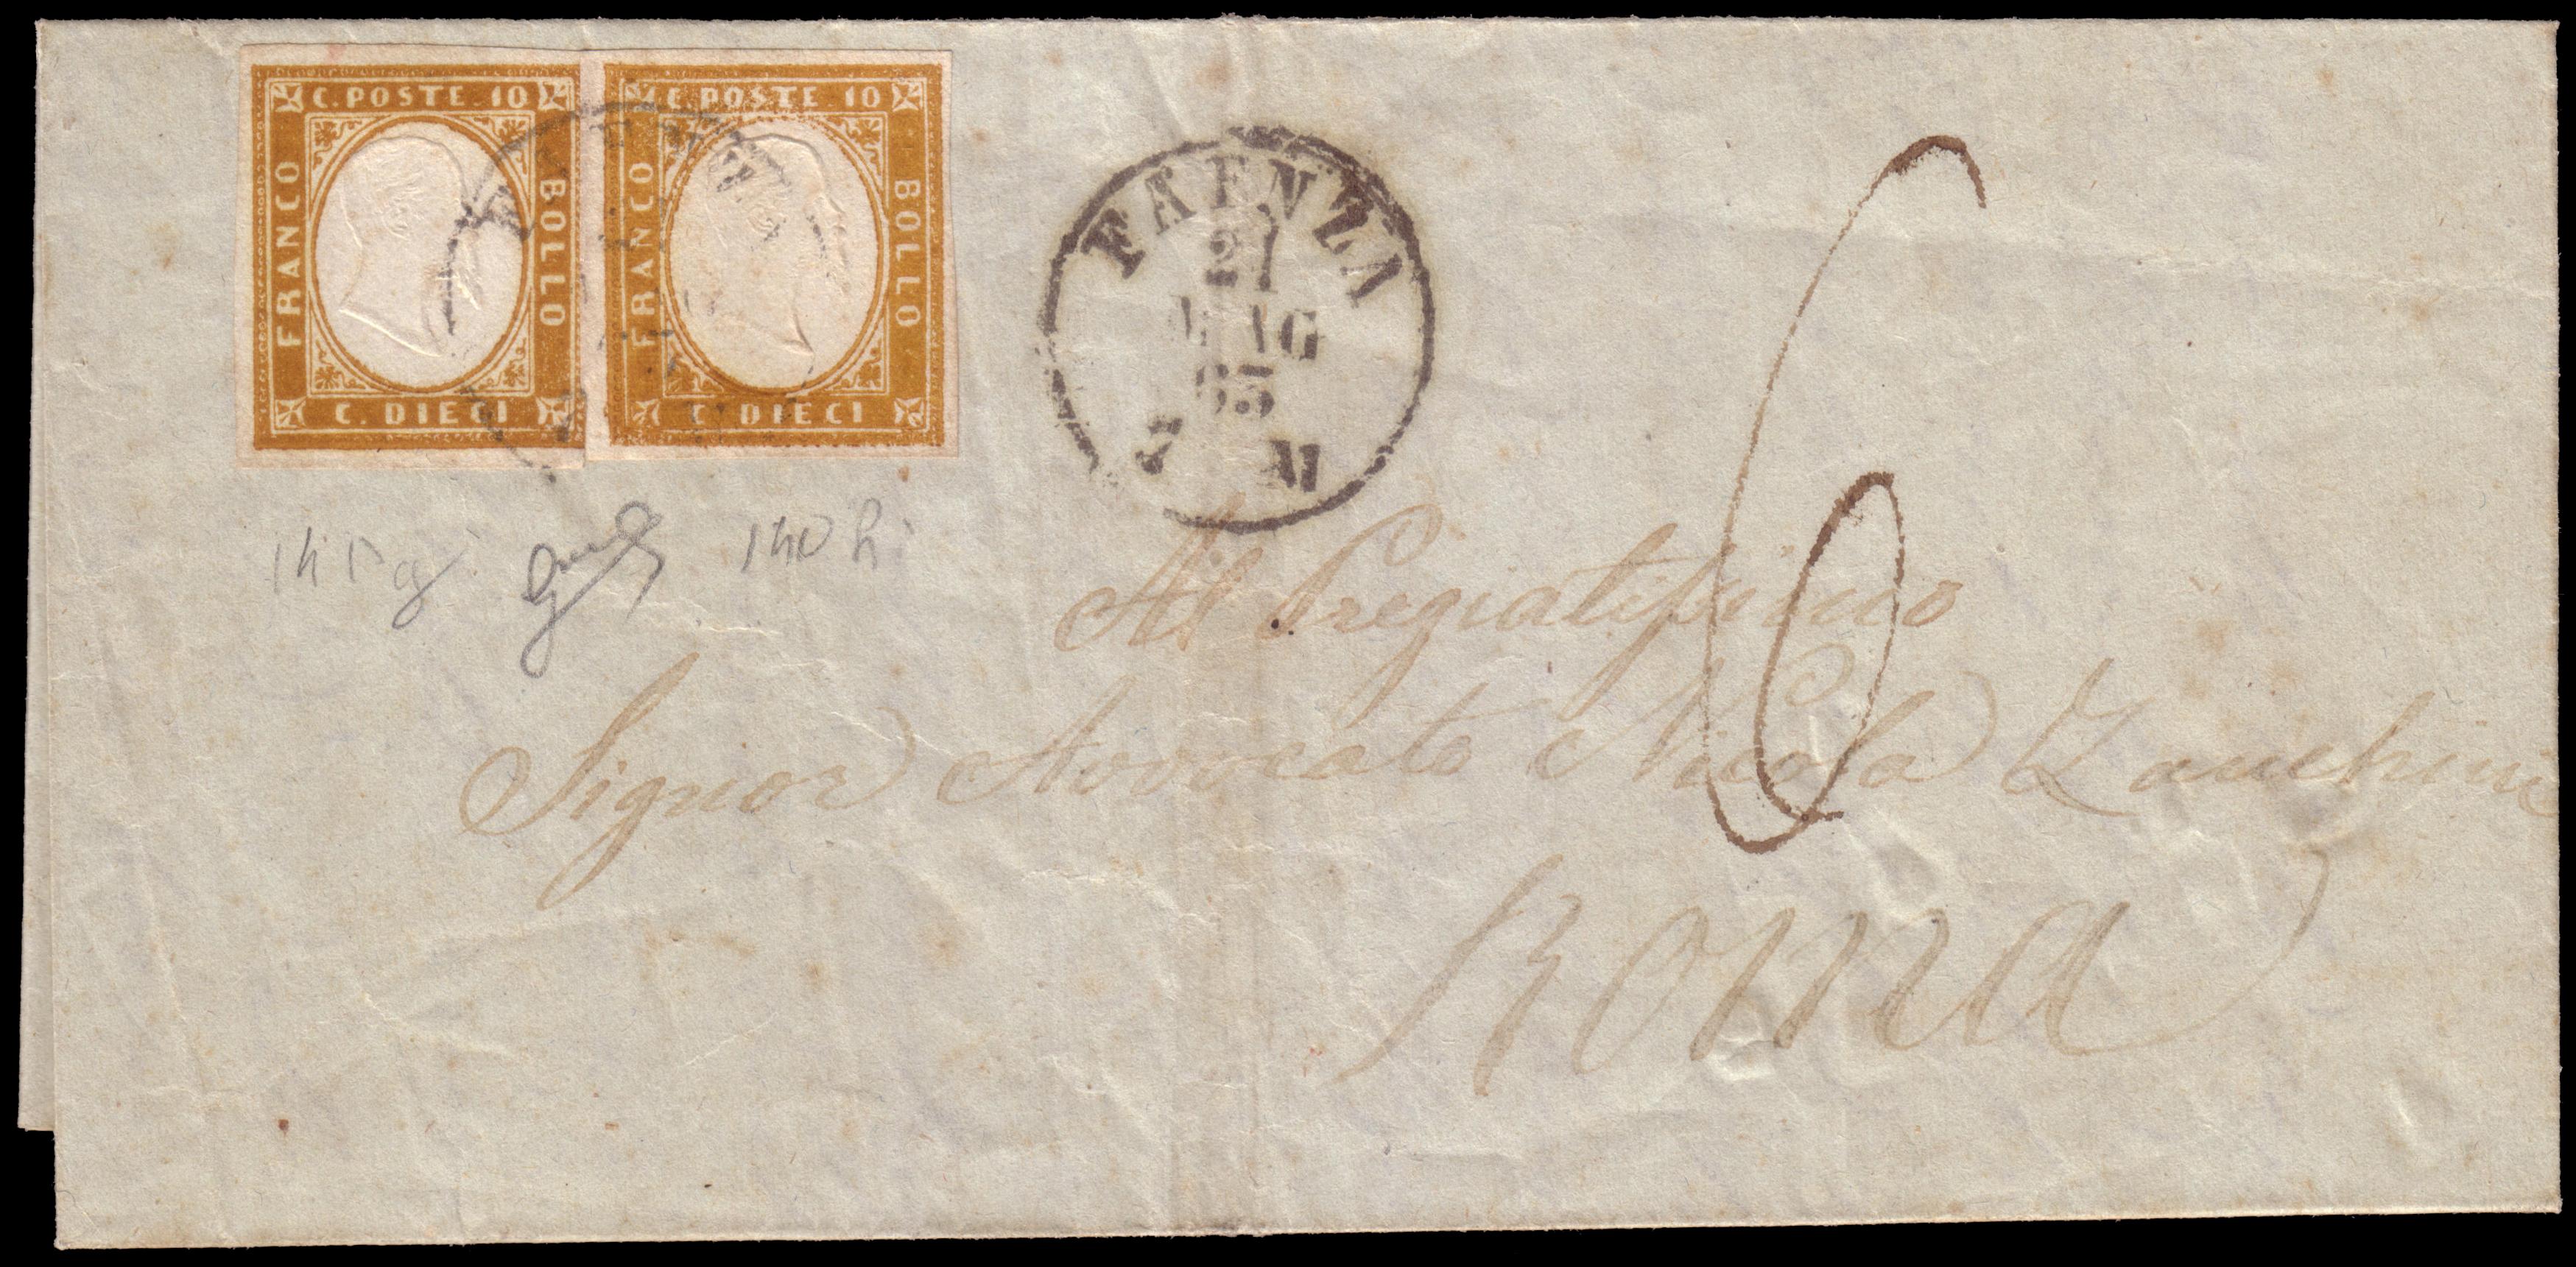 Lot 2415 - REGNO D'ITALIA Individual lots -  Ponte Auction House Stamps Auction 505